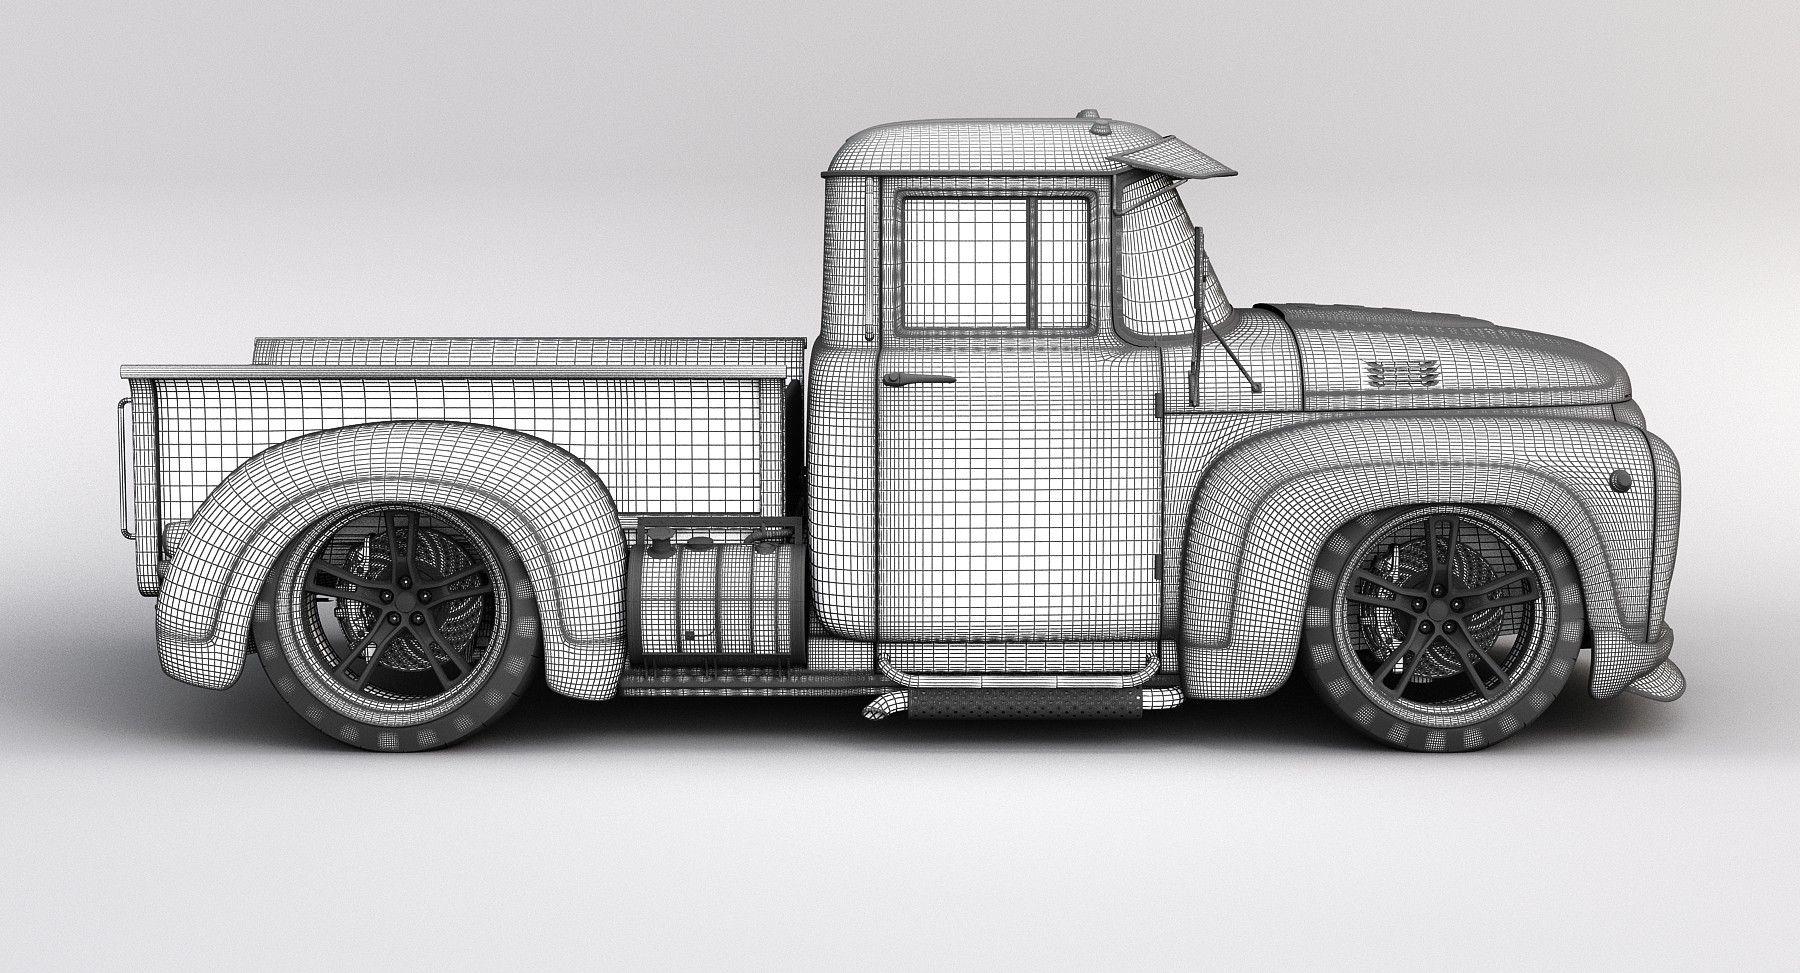 Custom Stance 3d Max Dibujos De Coches Dibujos De Autos Carros Y Camionetas